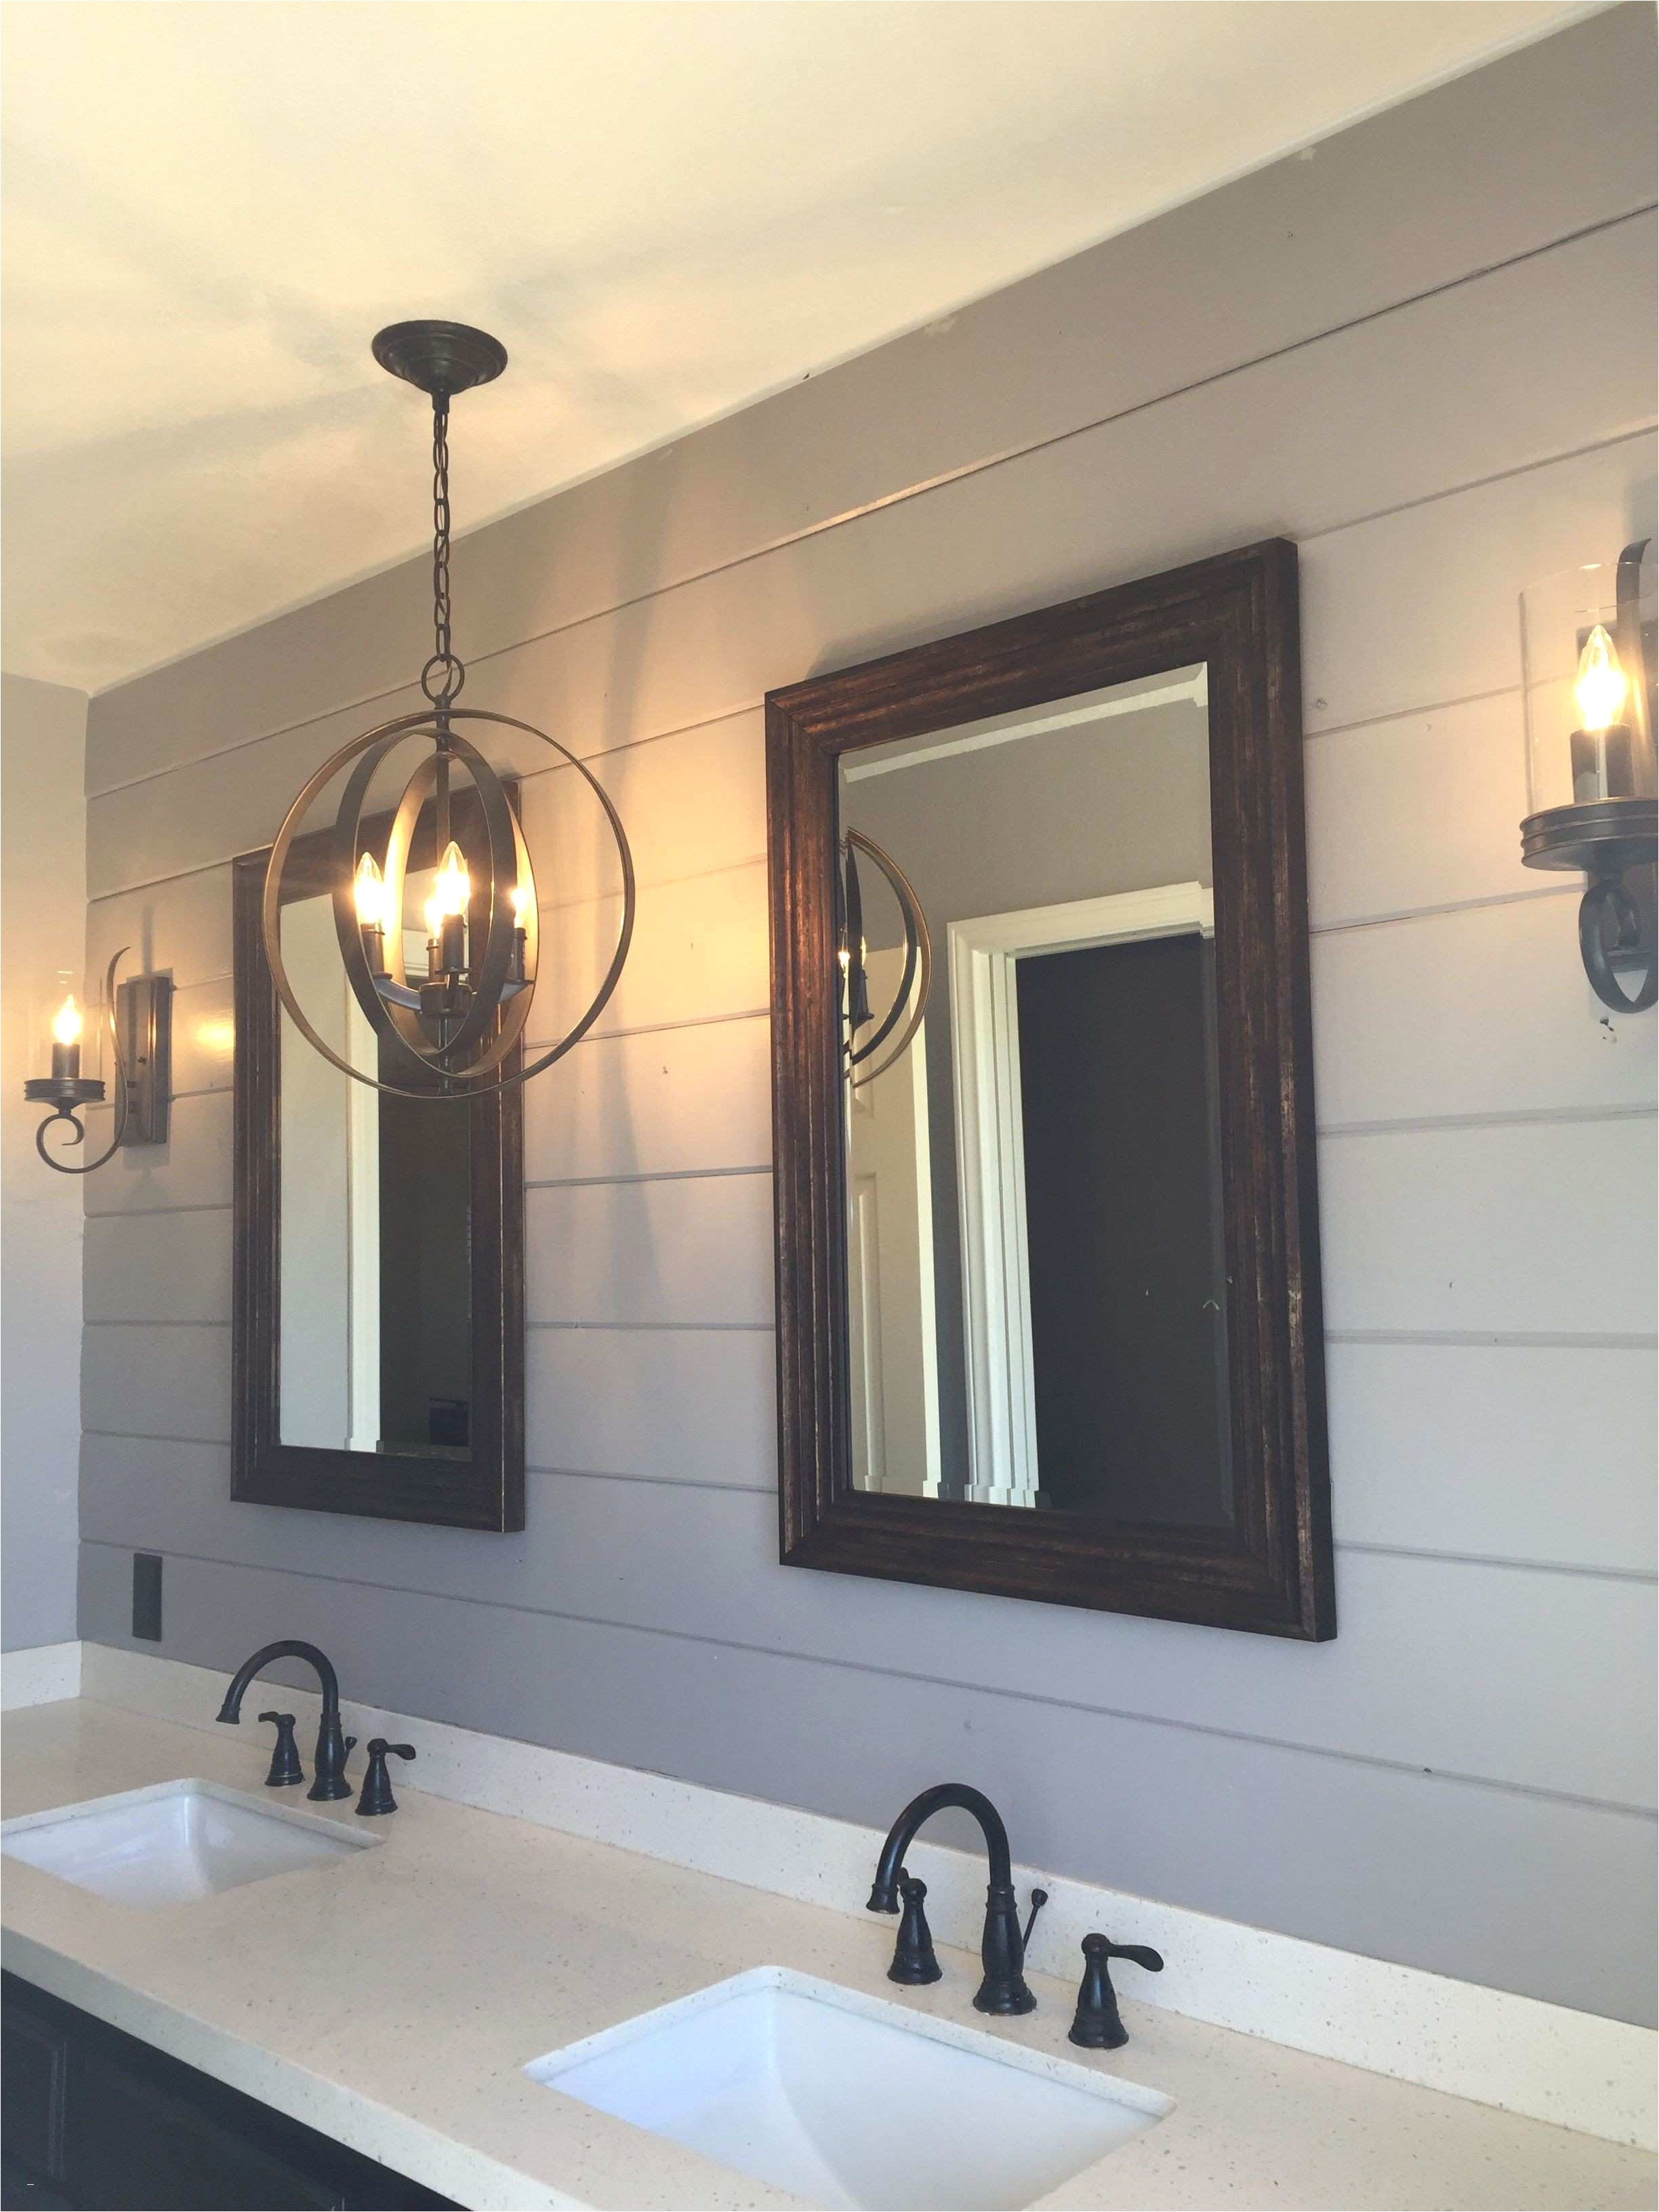 gallery walmart bathroom light fixtures inspirational ceiling track lighting 1 light ceiling track lighting walmart